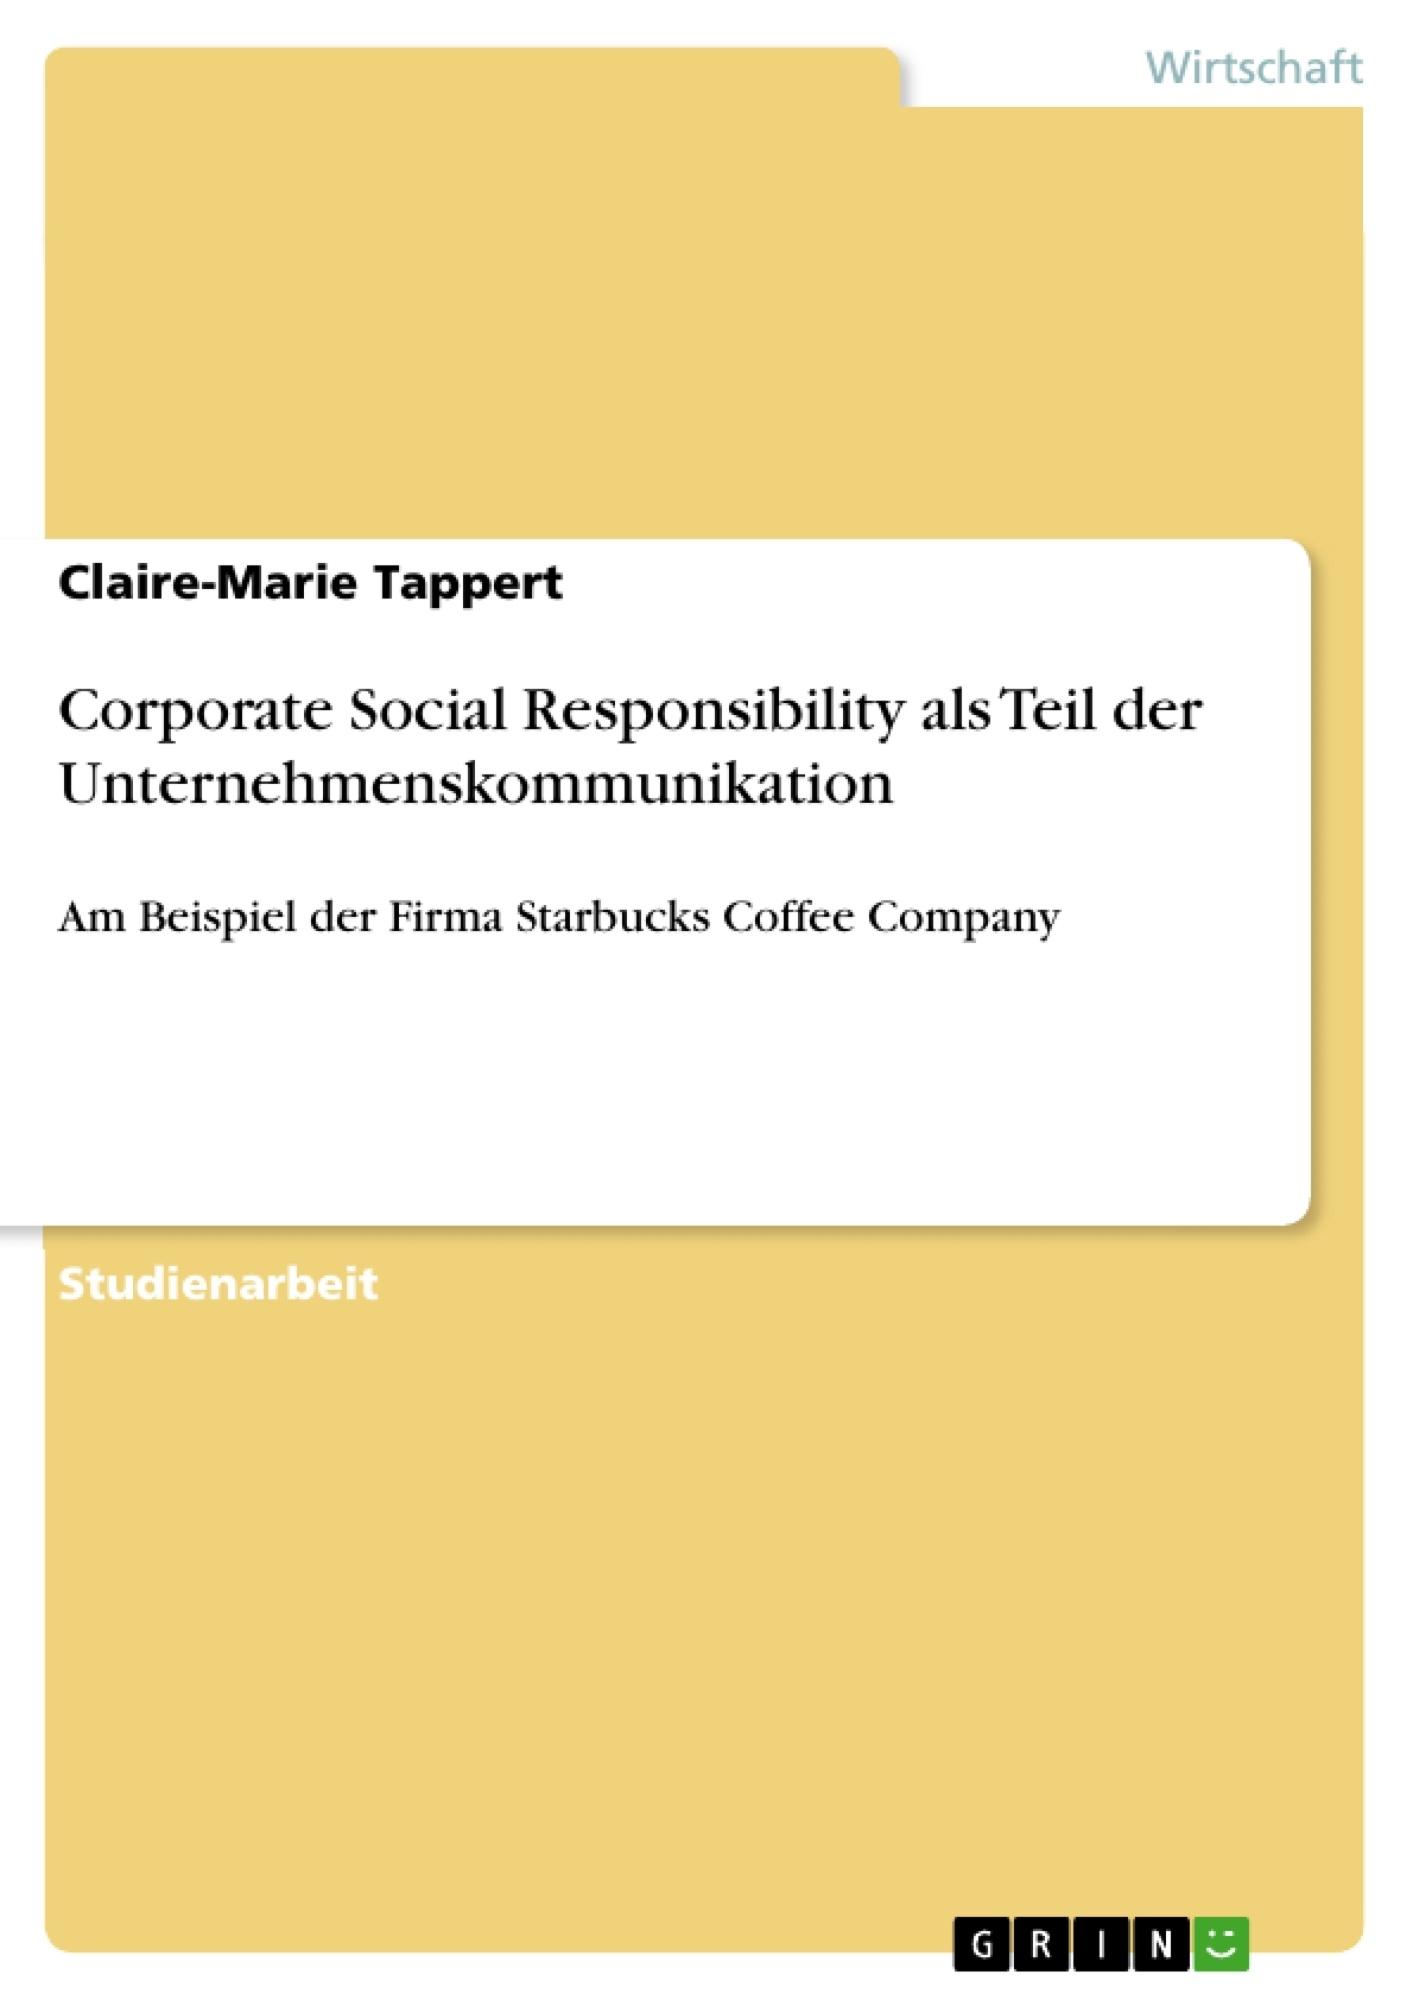 Titel: Corporate Social Responsibility als Teil der Unternehmenskommunikation